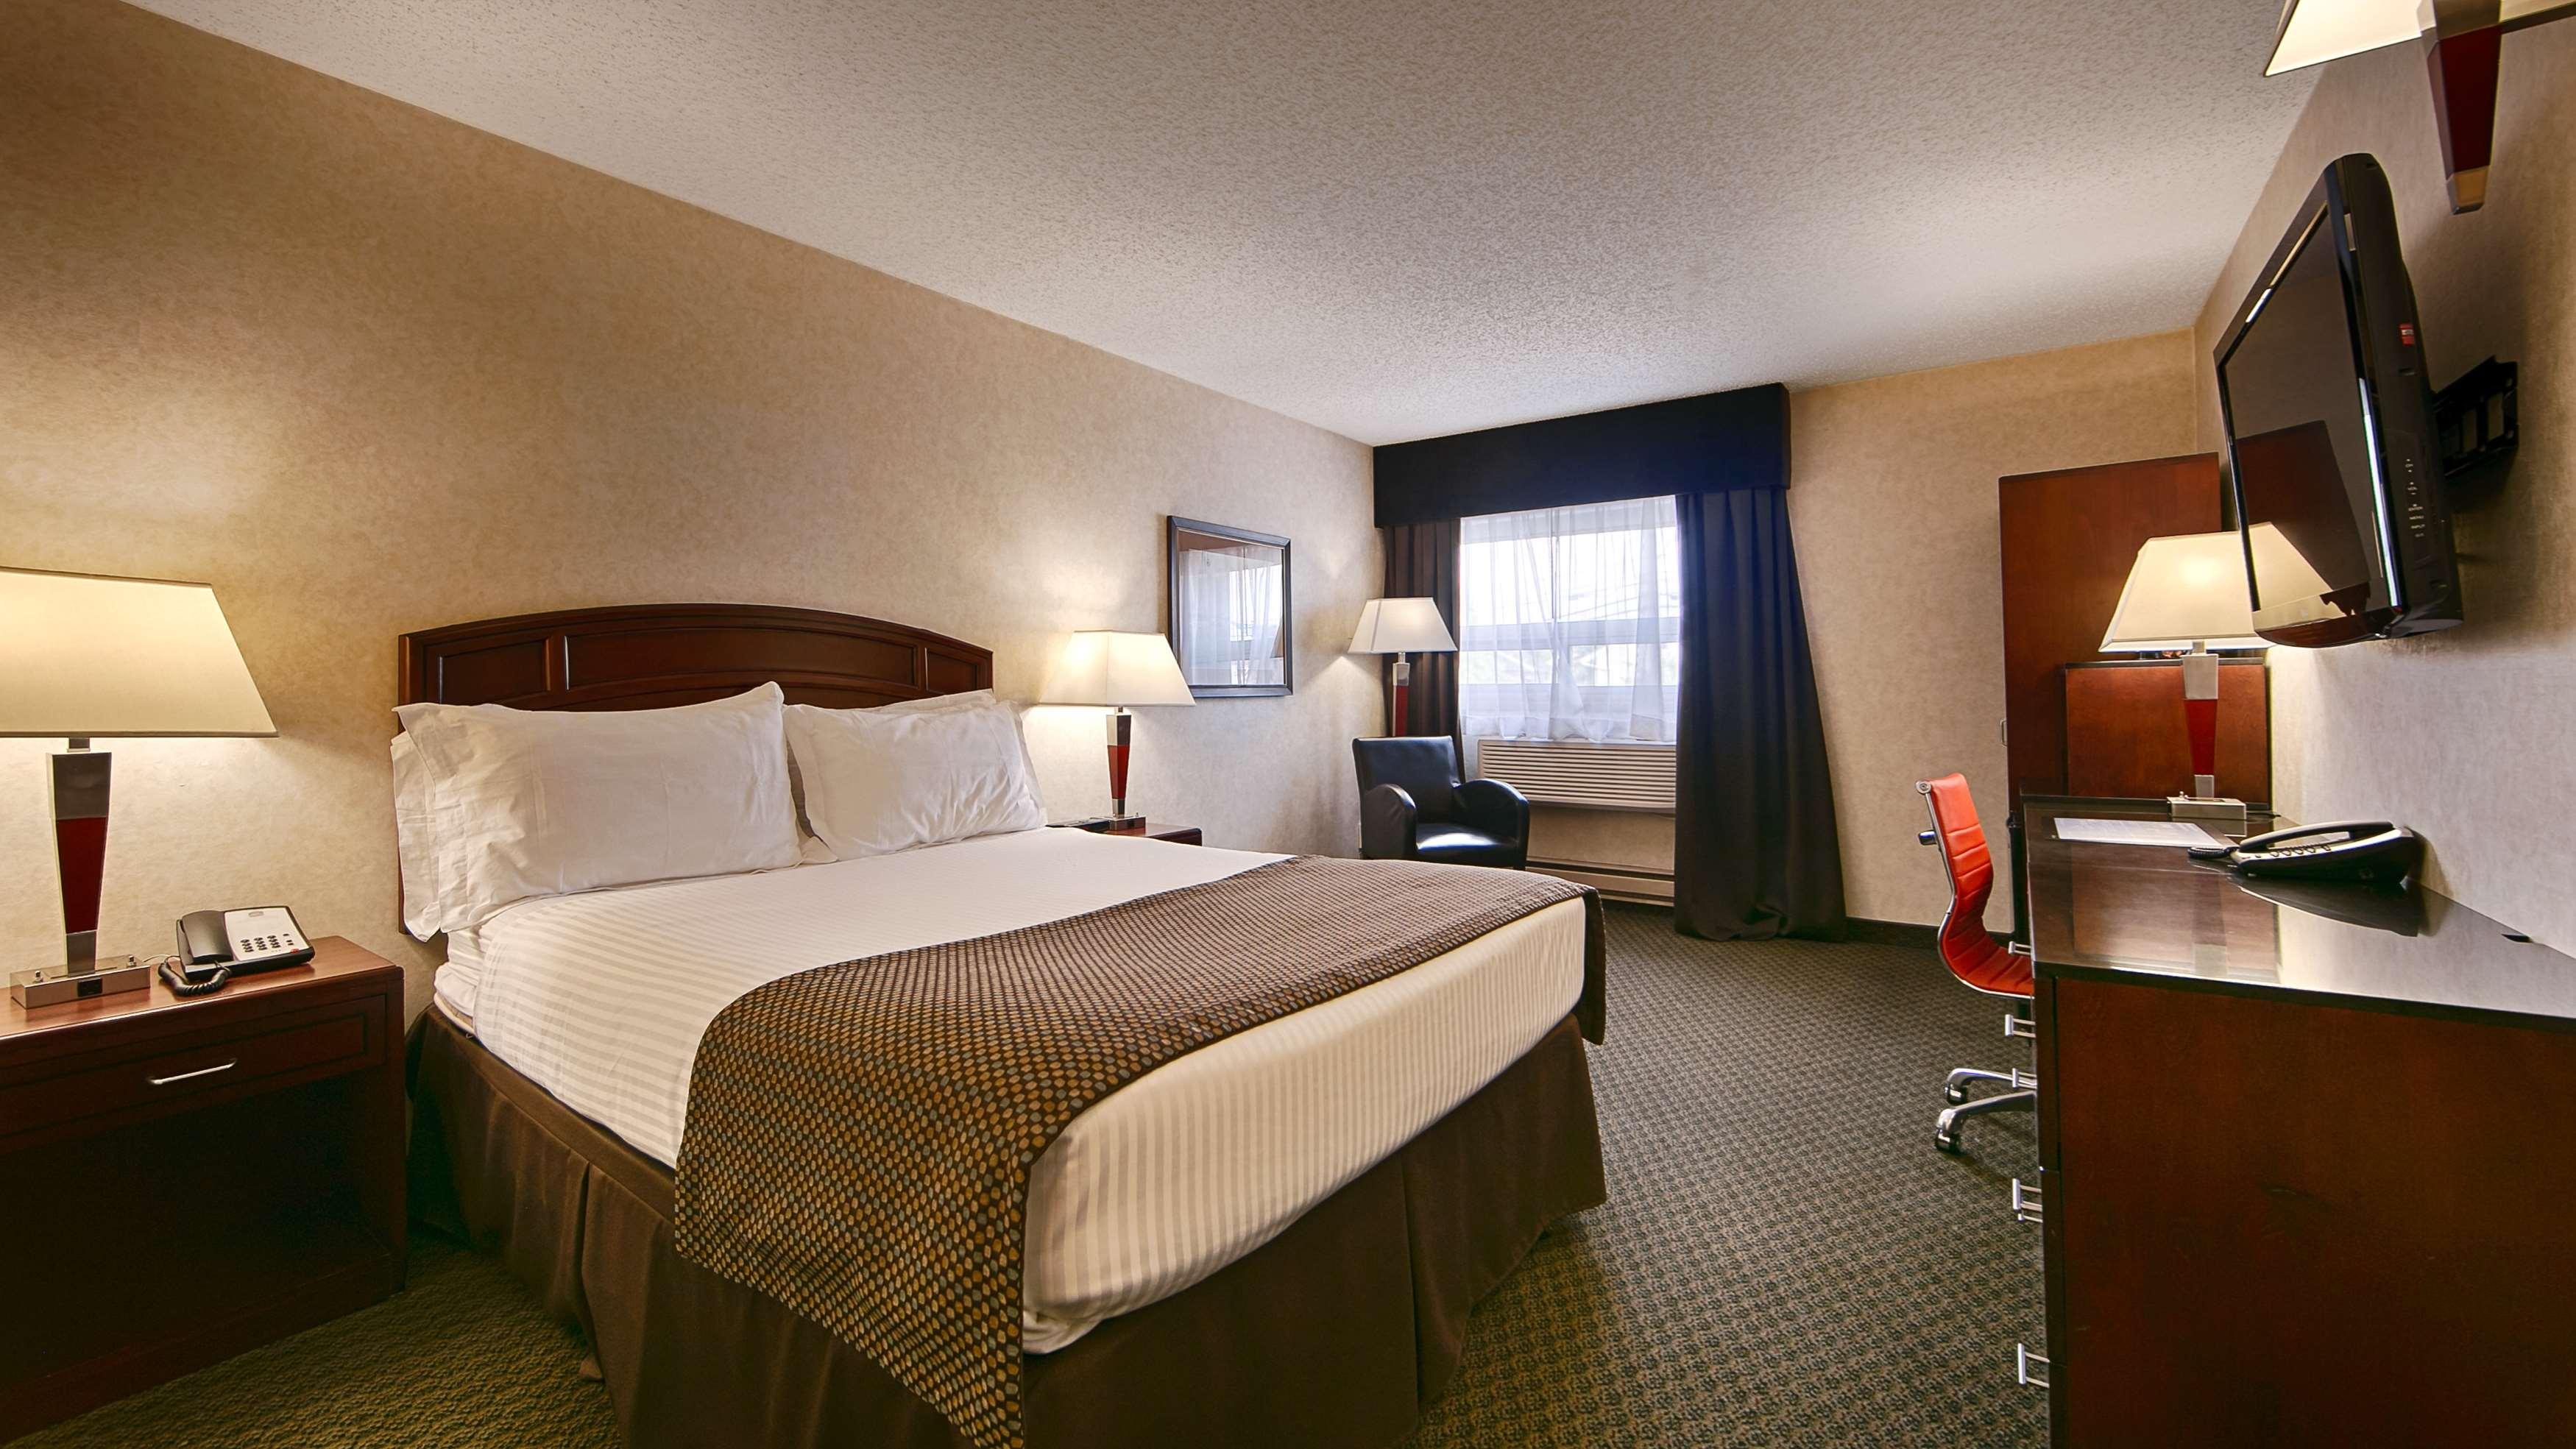 Best Western Airport Inn in Calgary: Queen Bed Guest Room